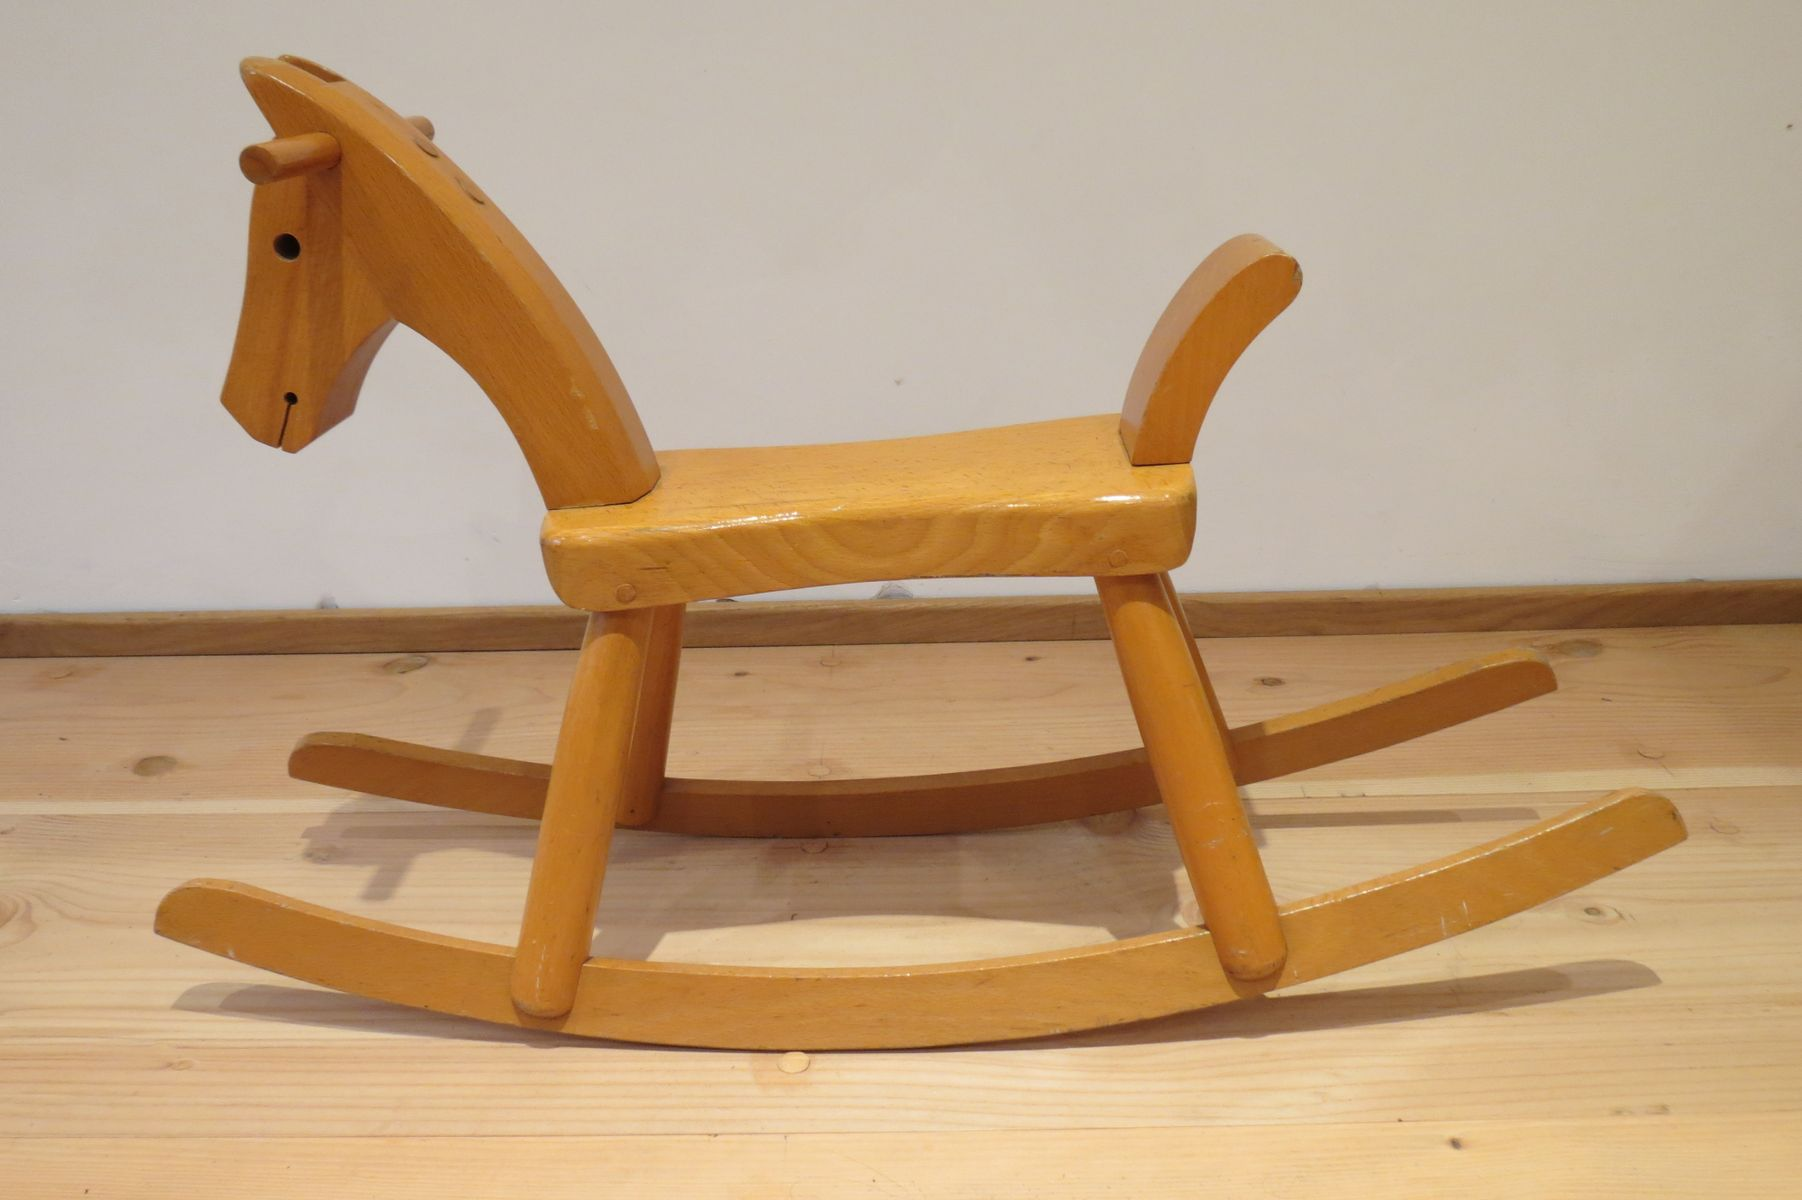 Vintage rocking horse from kay bojesen 1960s for sale at for Vintage horseshoes for sale